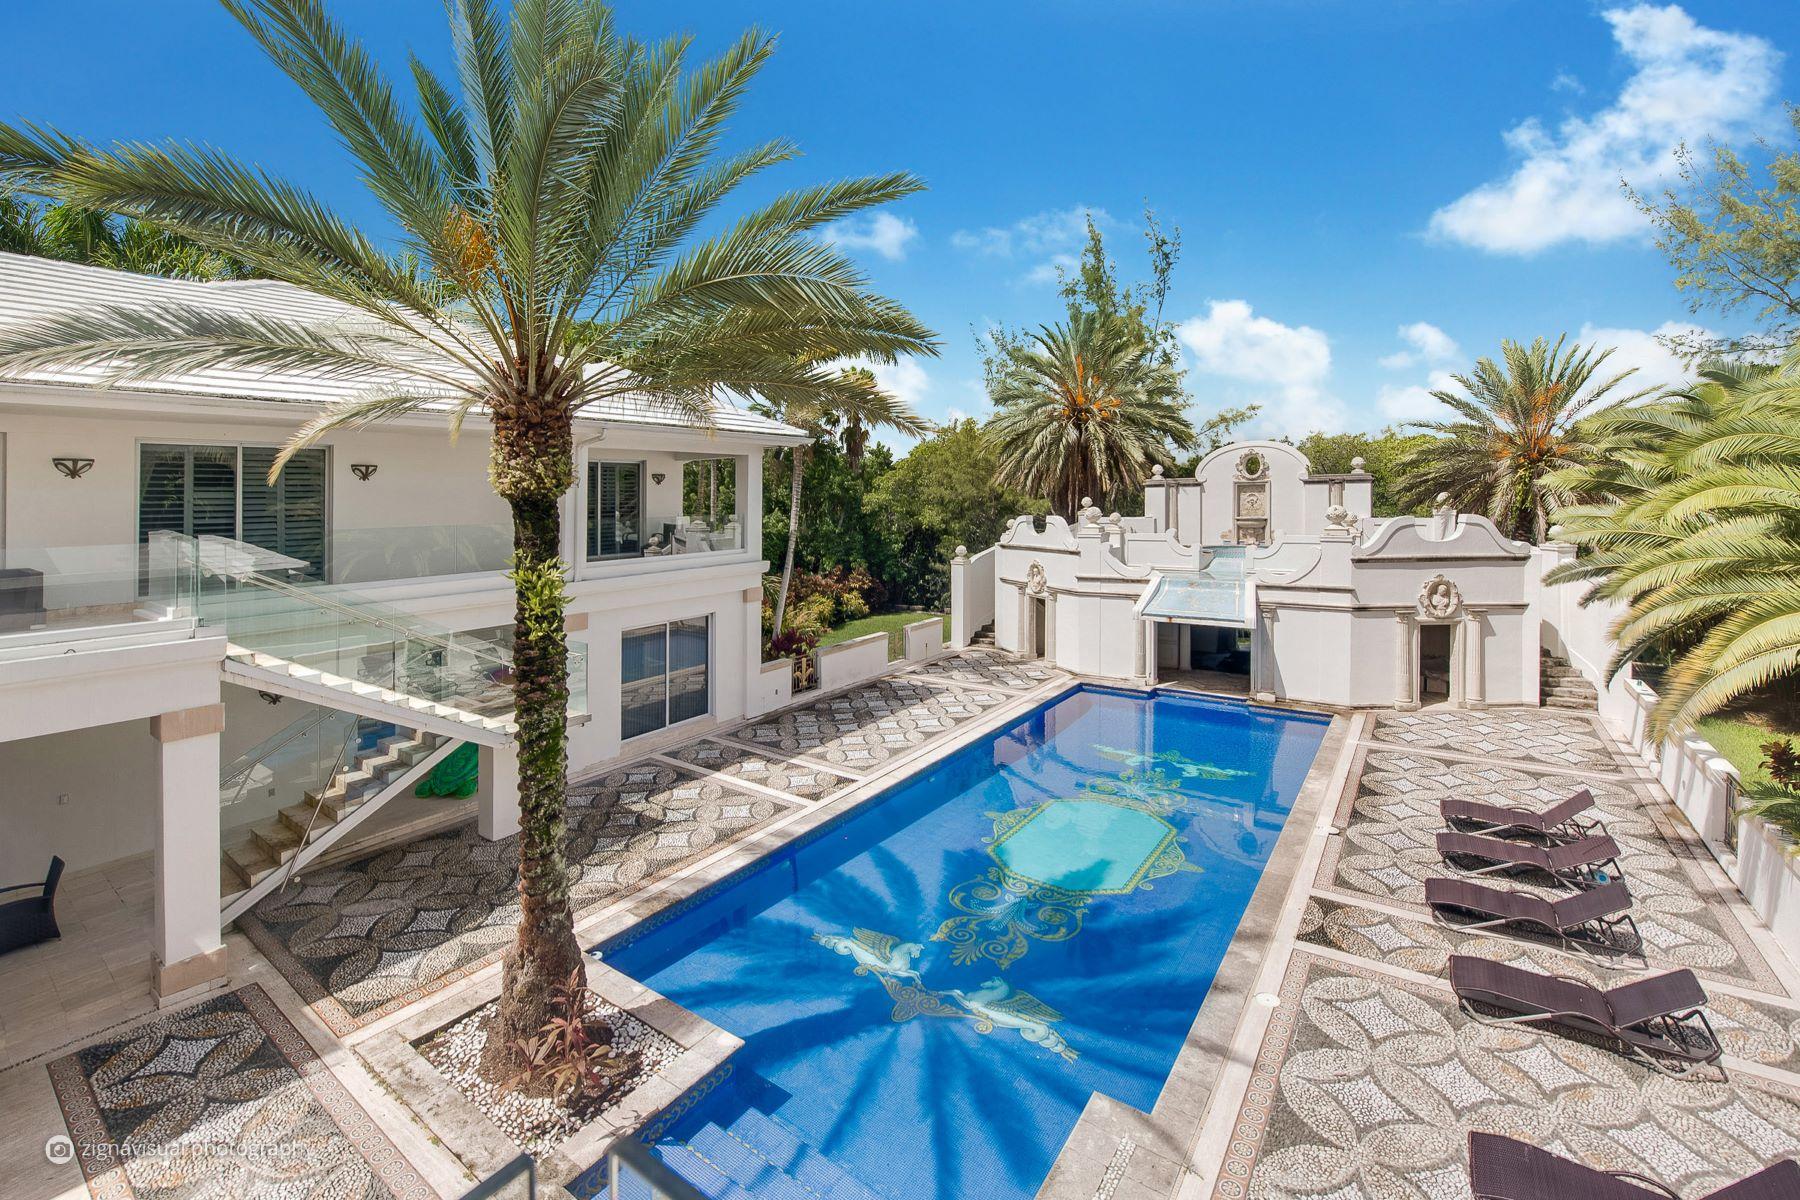 Maison unifamiliale pour l Vente à 2 Tahiti Beach Island 2Tahiti Beach Island Coral Gables, Florida, 33143 États-Unis